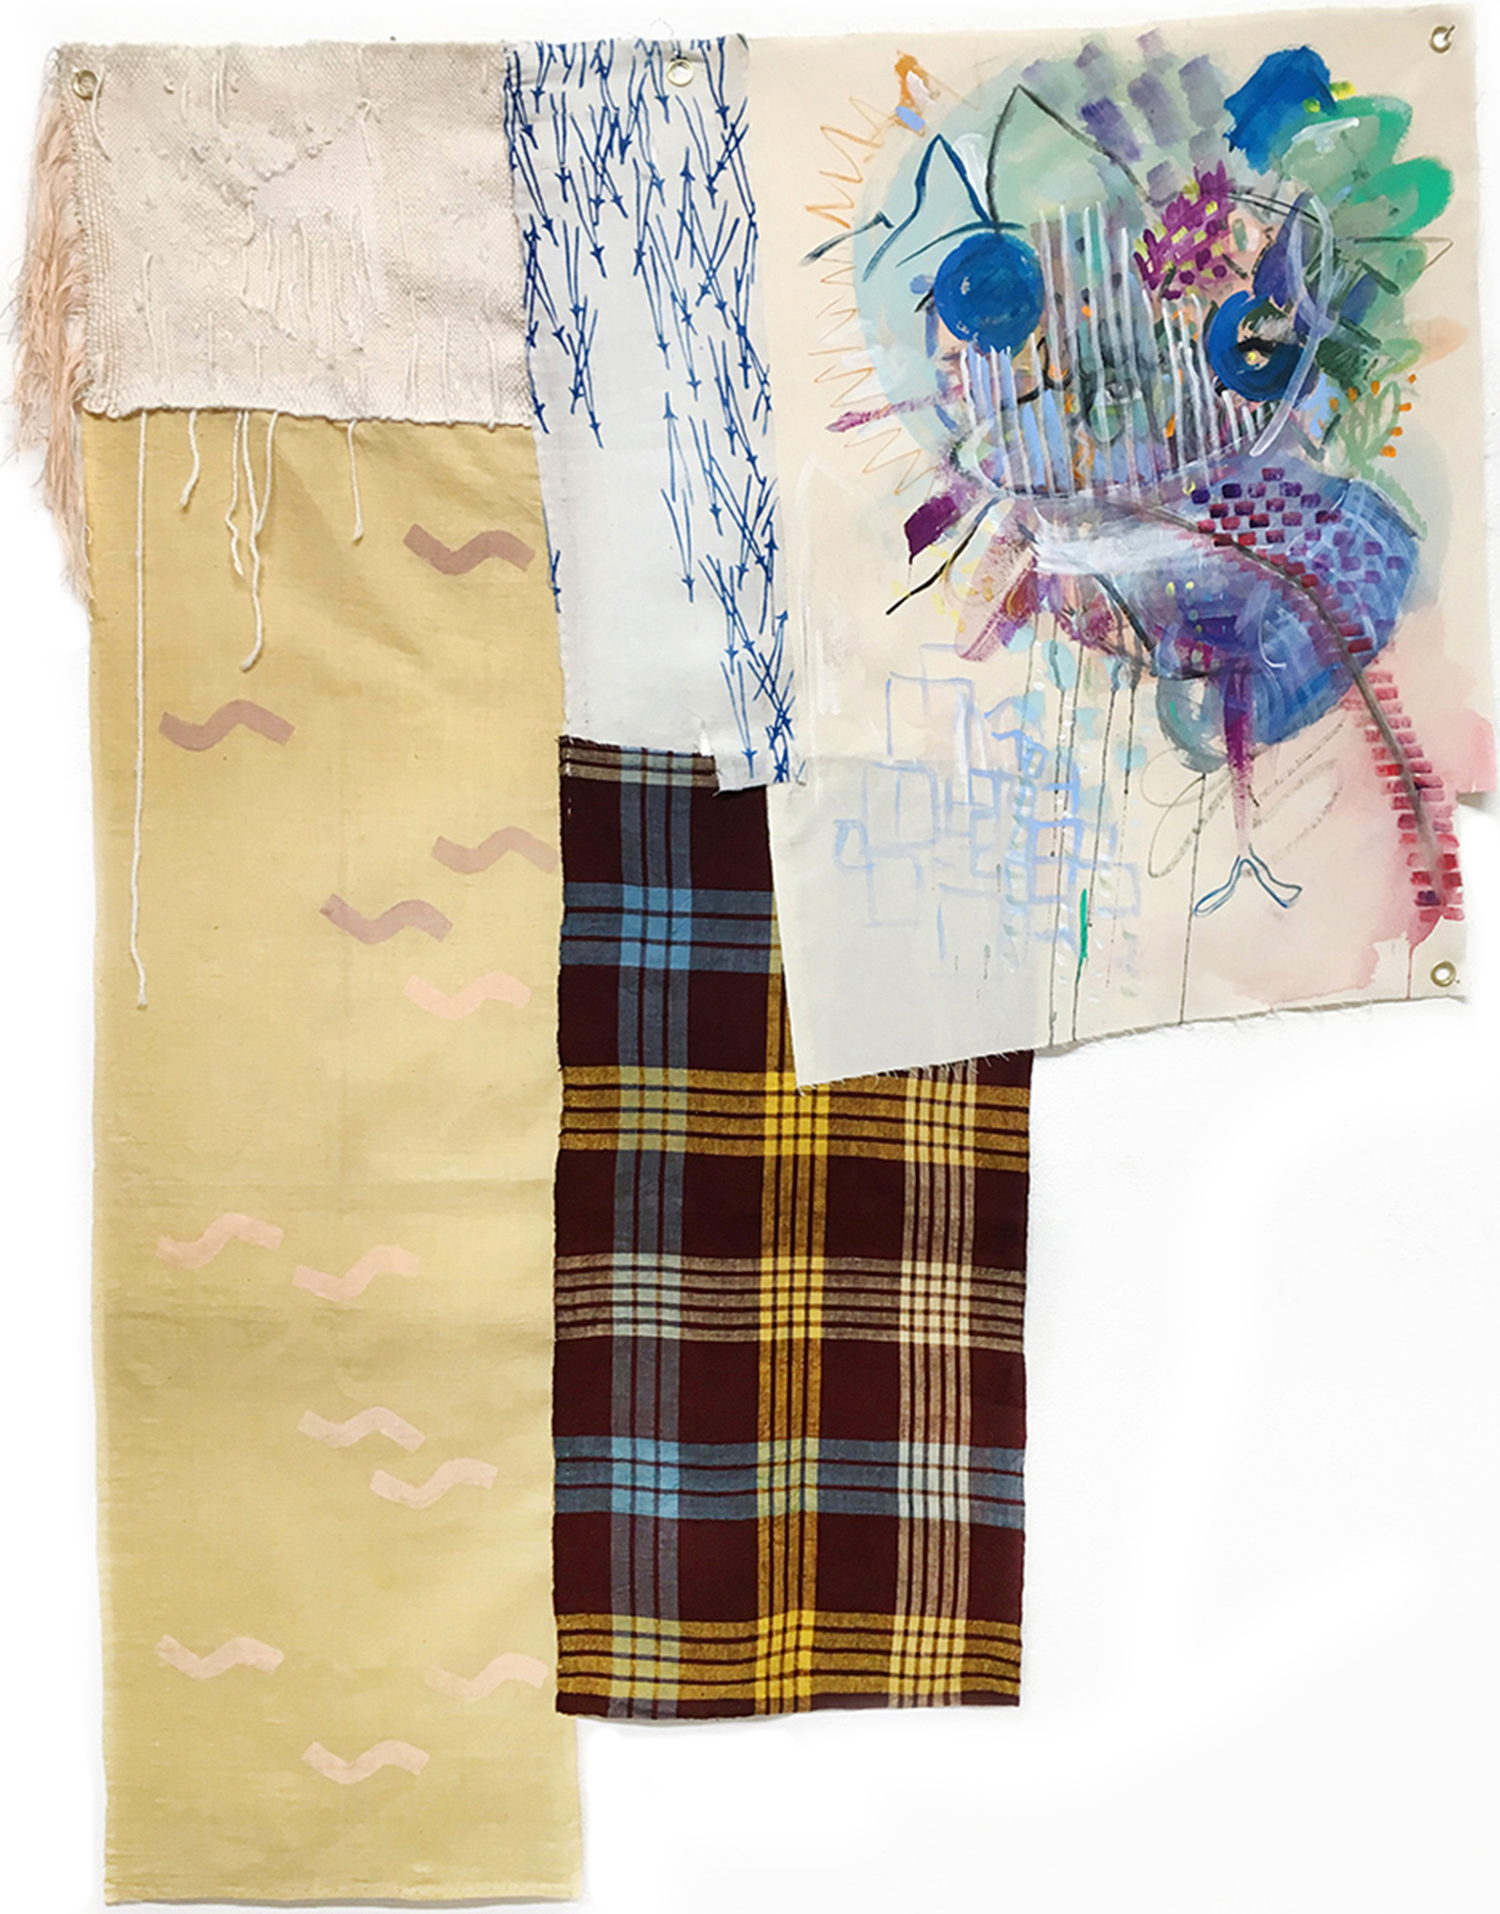 Nina-Tobien-painting-patchwork-curtain-weaving-shibori-waves-potato-print-checkerbord-natural-dying-loose-canvas-landscape